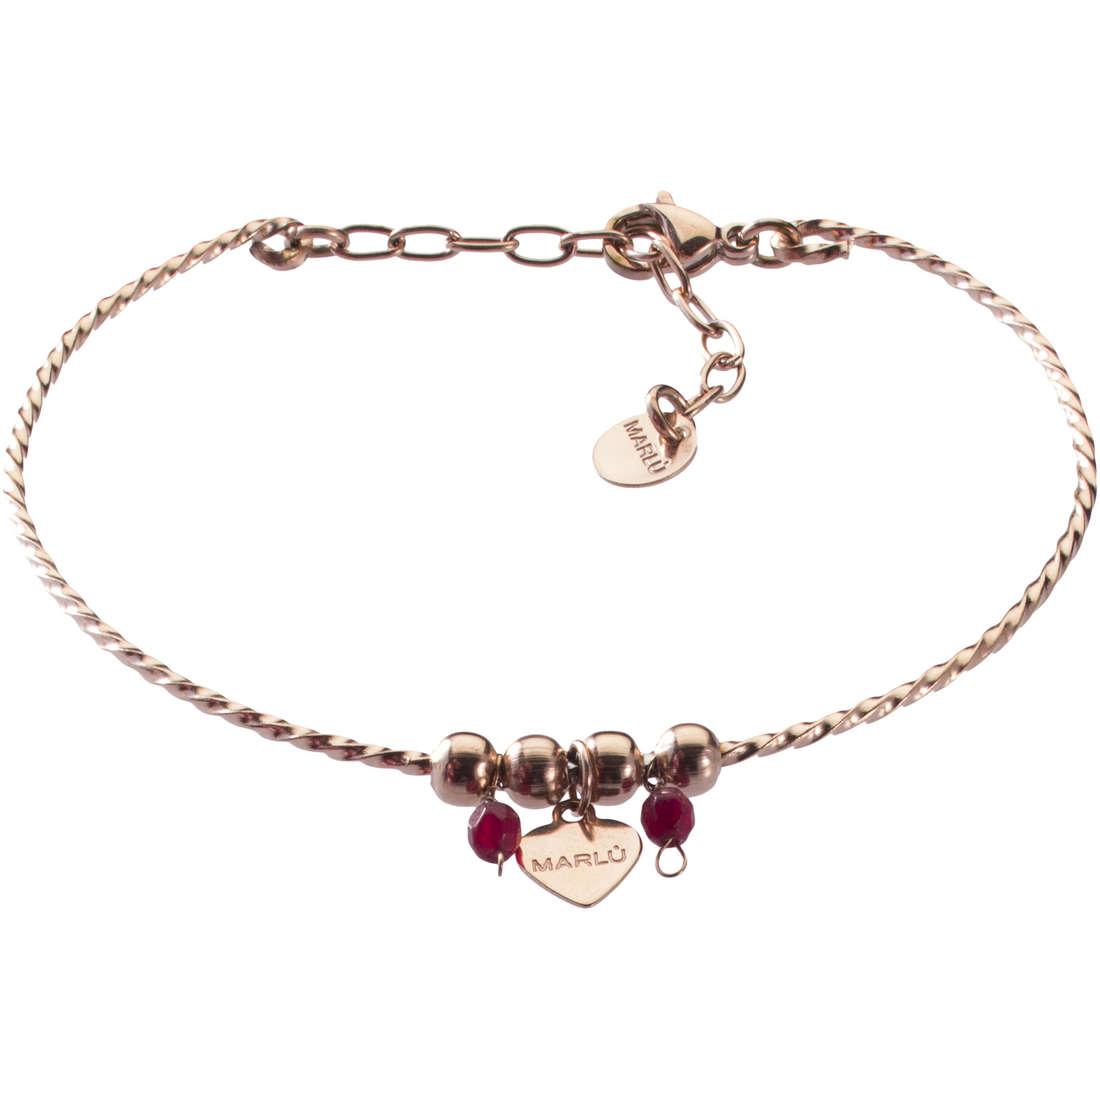 bracelet woman jewellery Marlù Clover 18BR041R